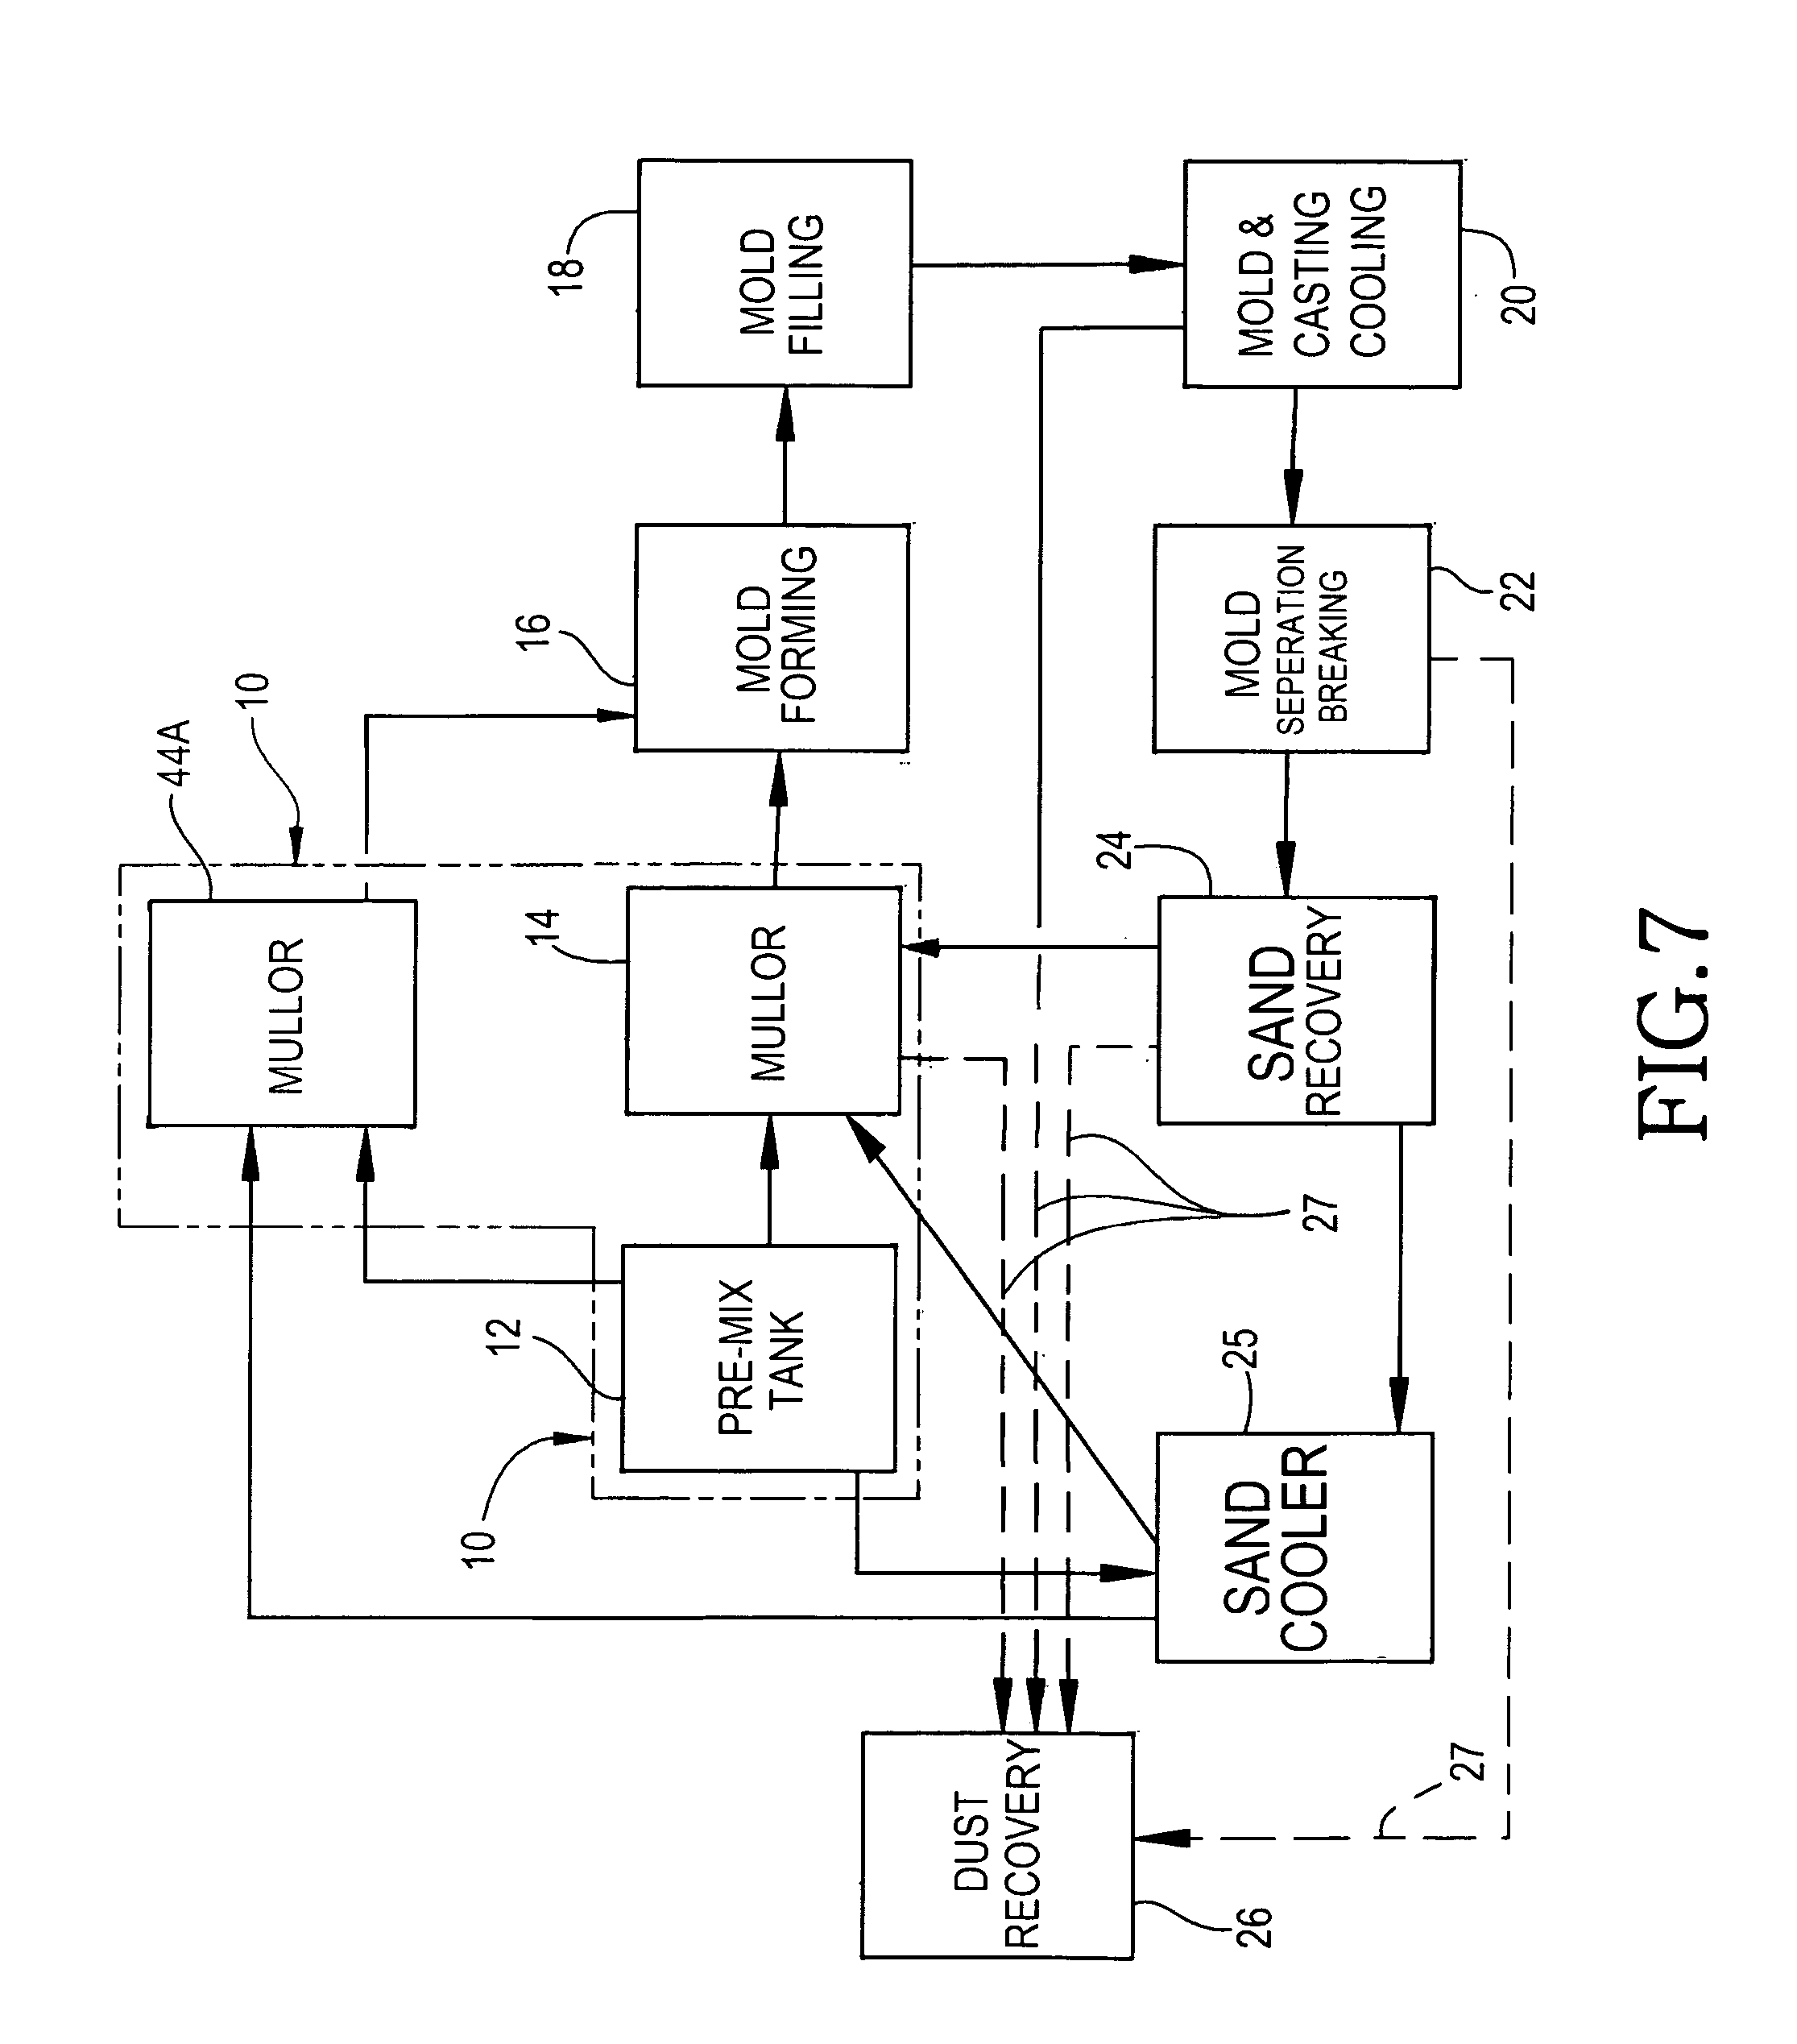 3 way switch ladder diagram leviton single pole with pilot light wiring 509 motor starter imageresizertool com